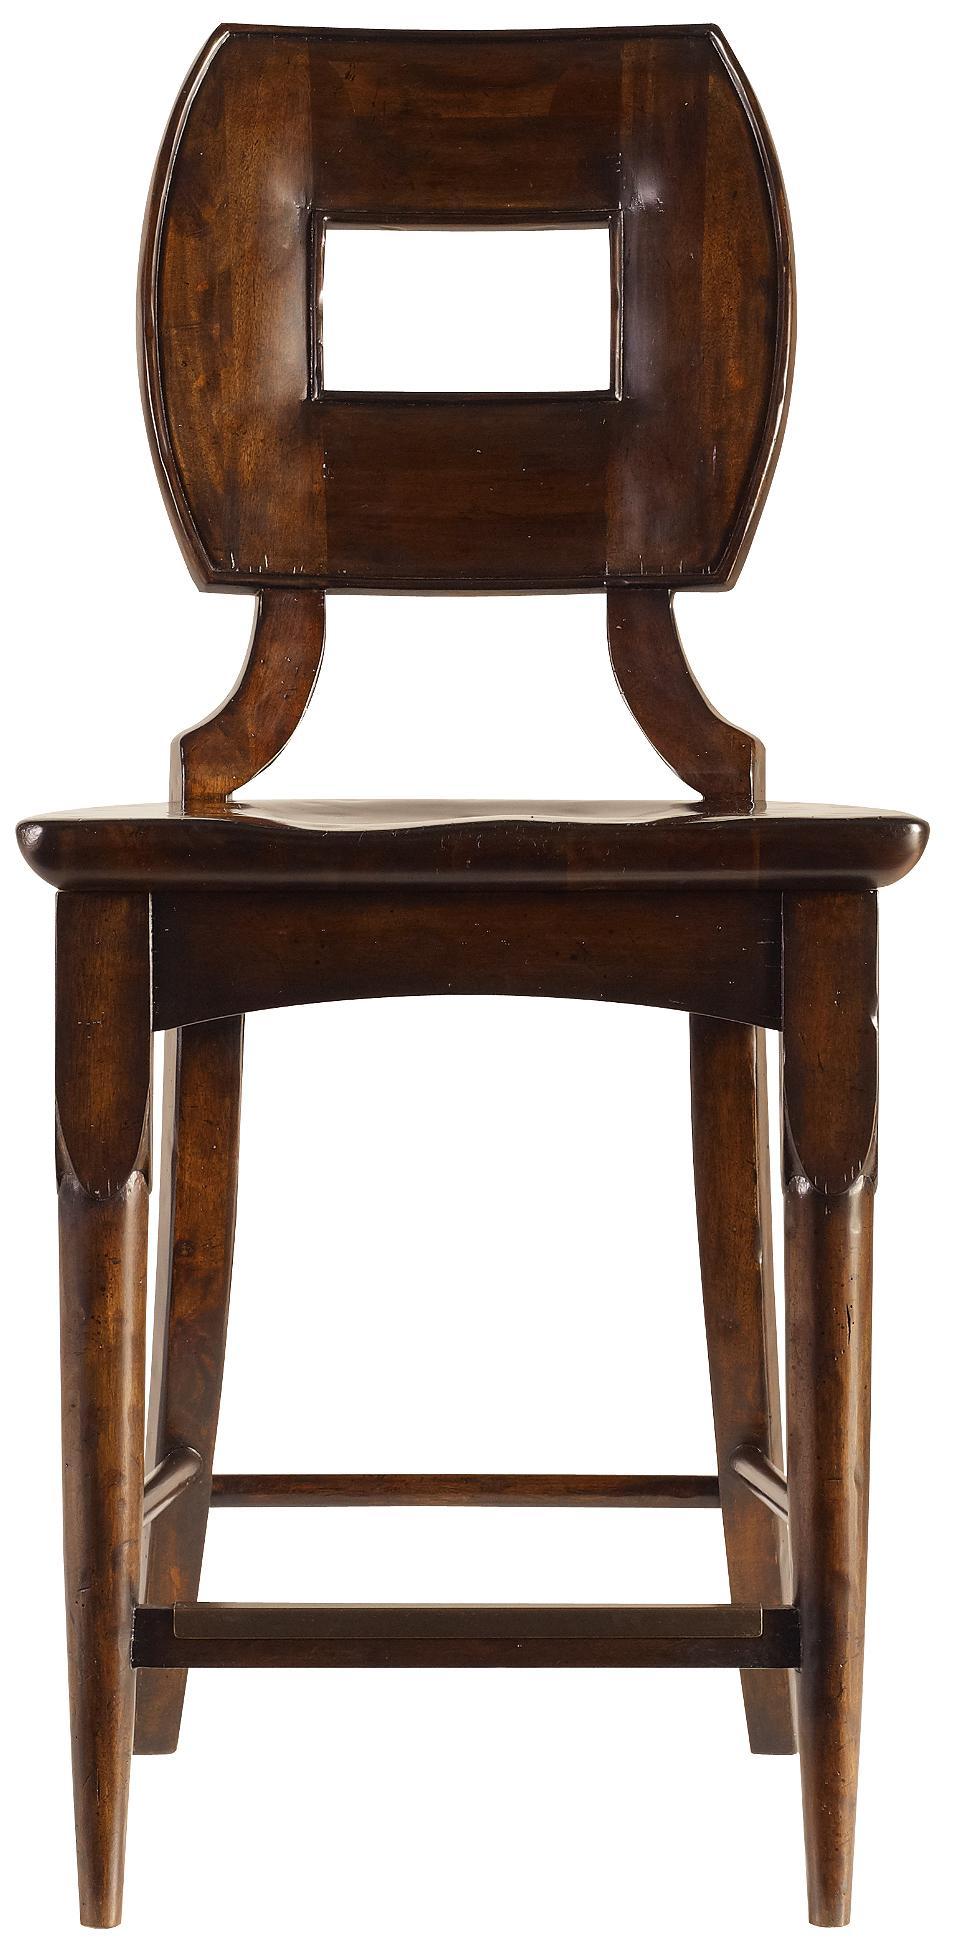 Stanley Furniture The Classic Portfolio Artisan Counter Stool - Item Number: 135-11-72